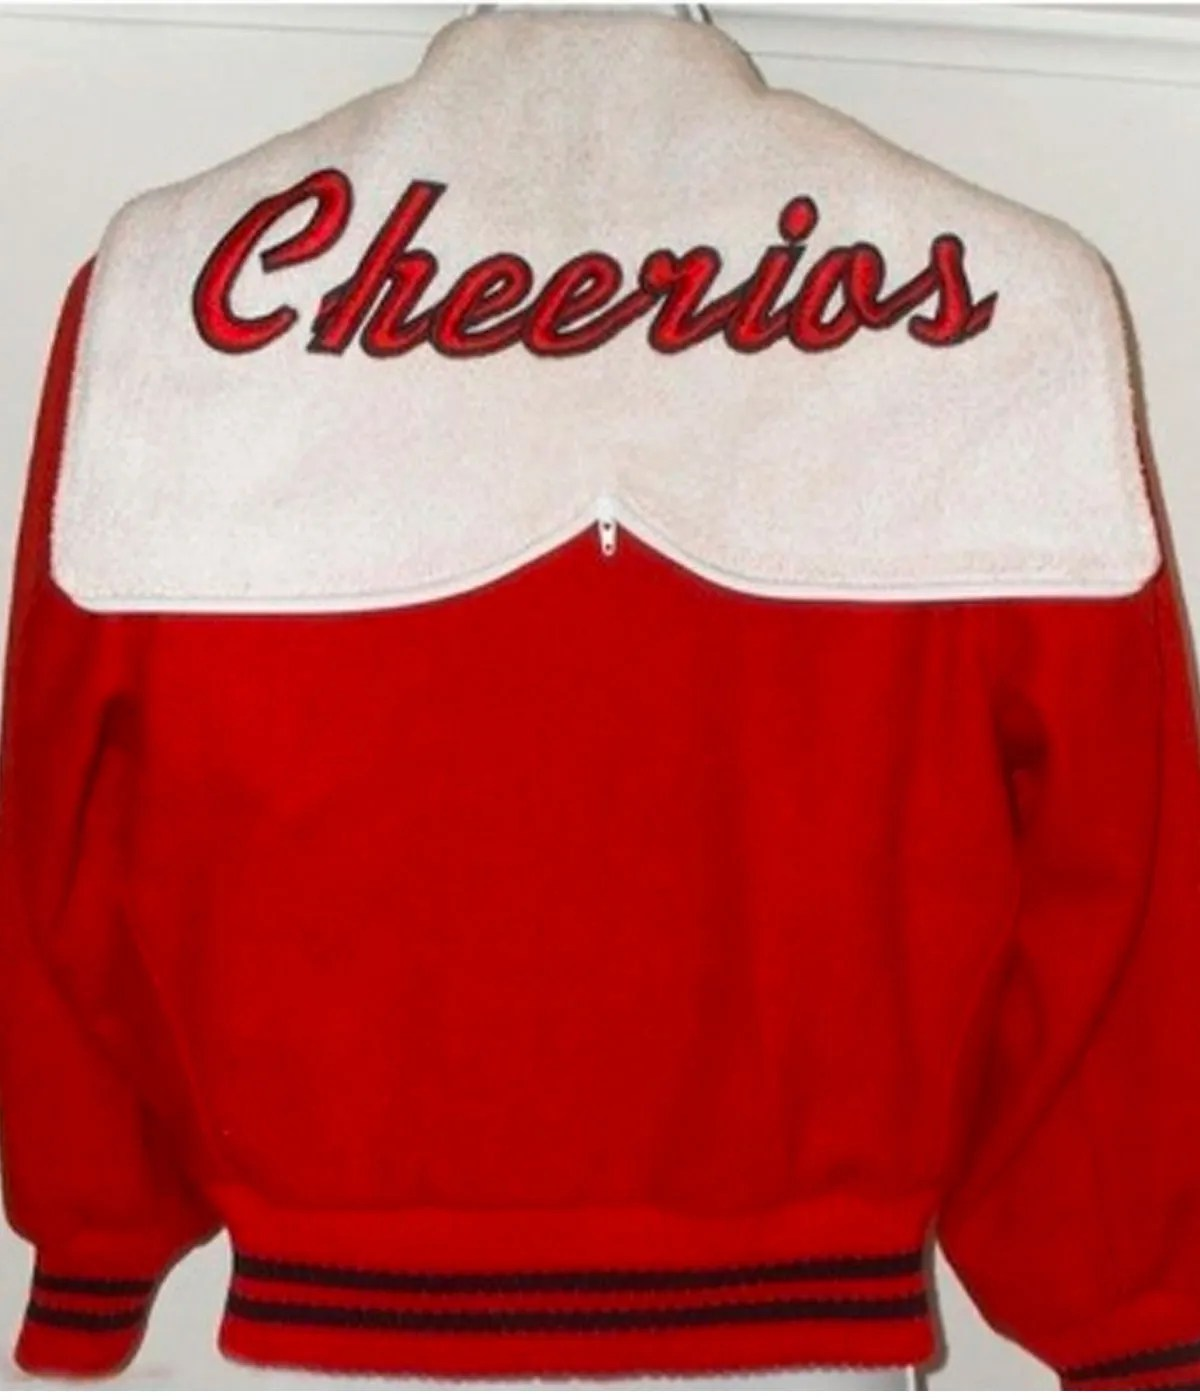 cheerios-brittany-pierce-glee-cheerleading-varsity-jacket